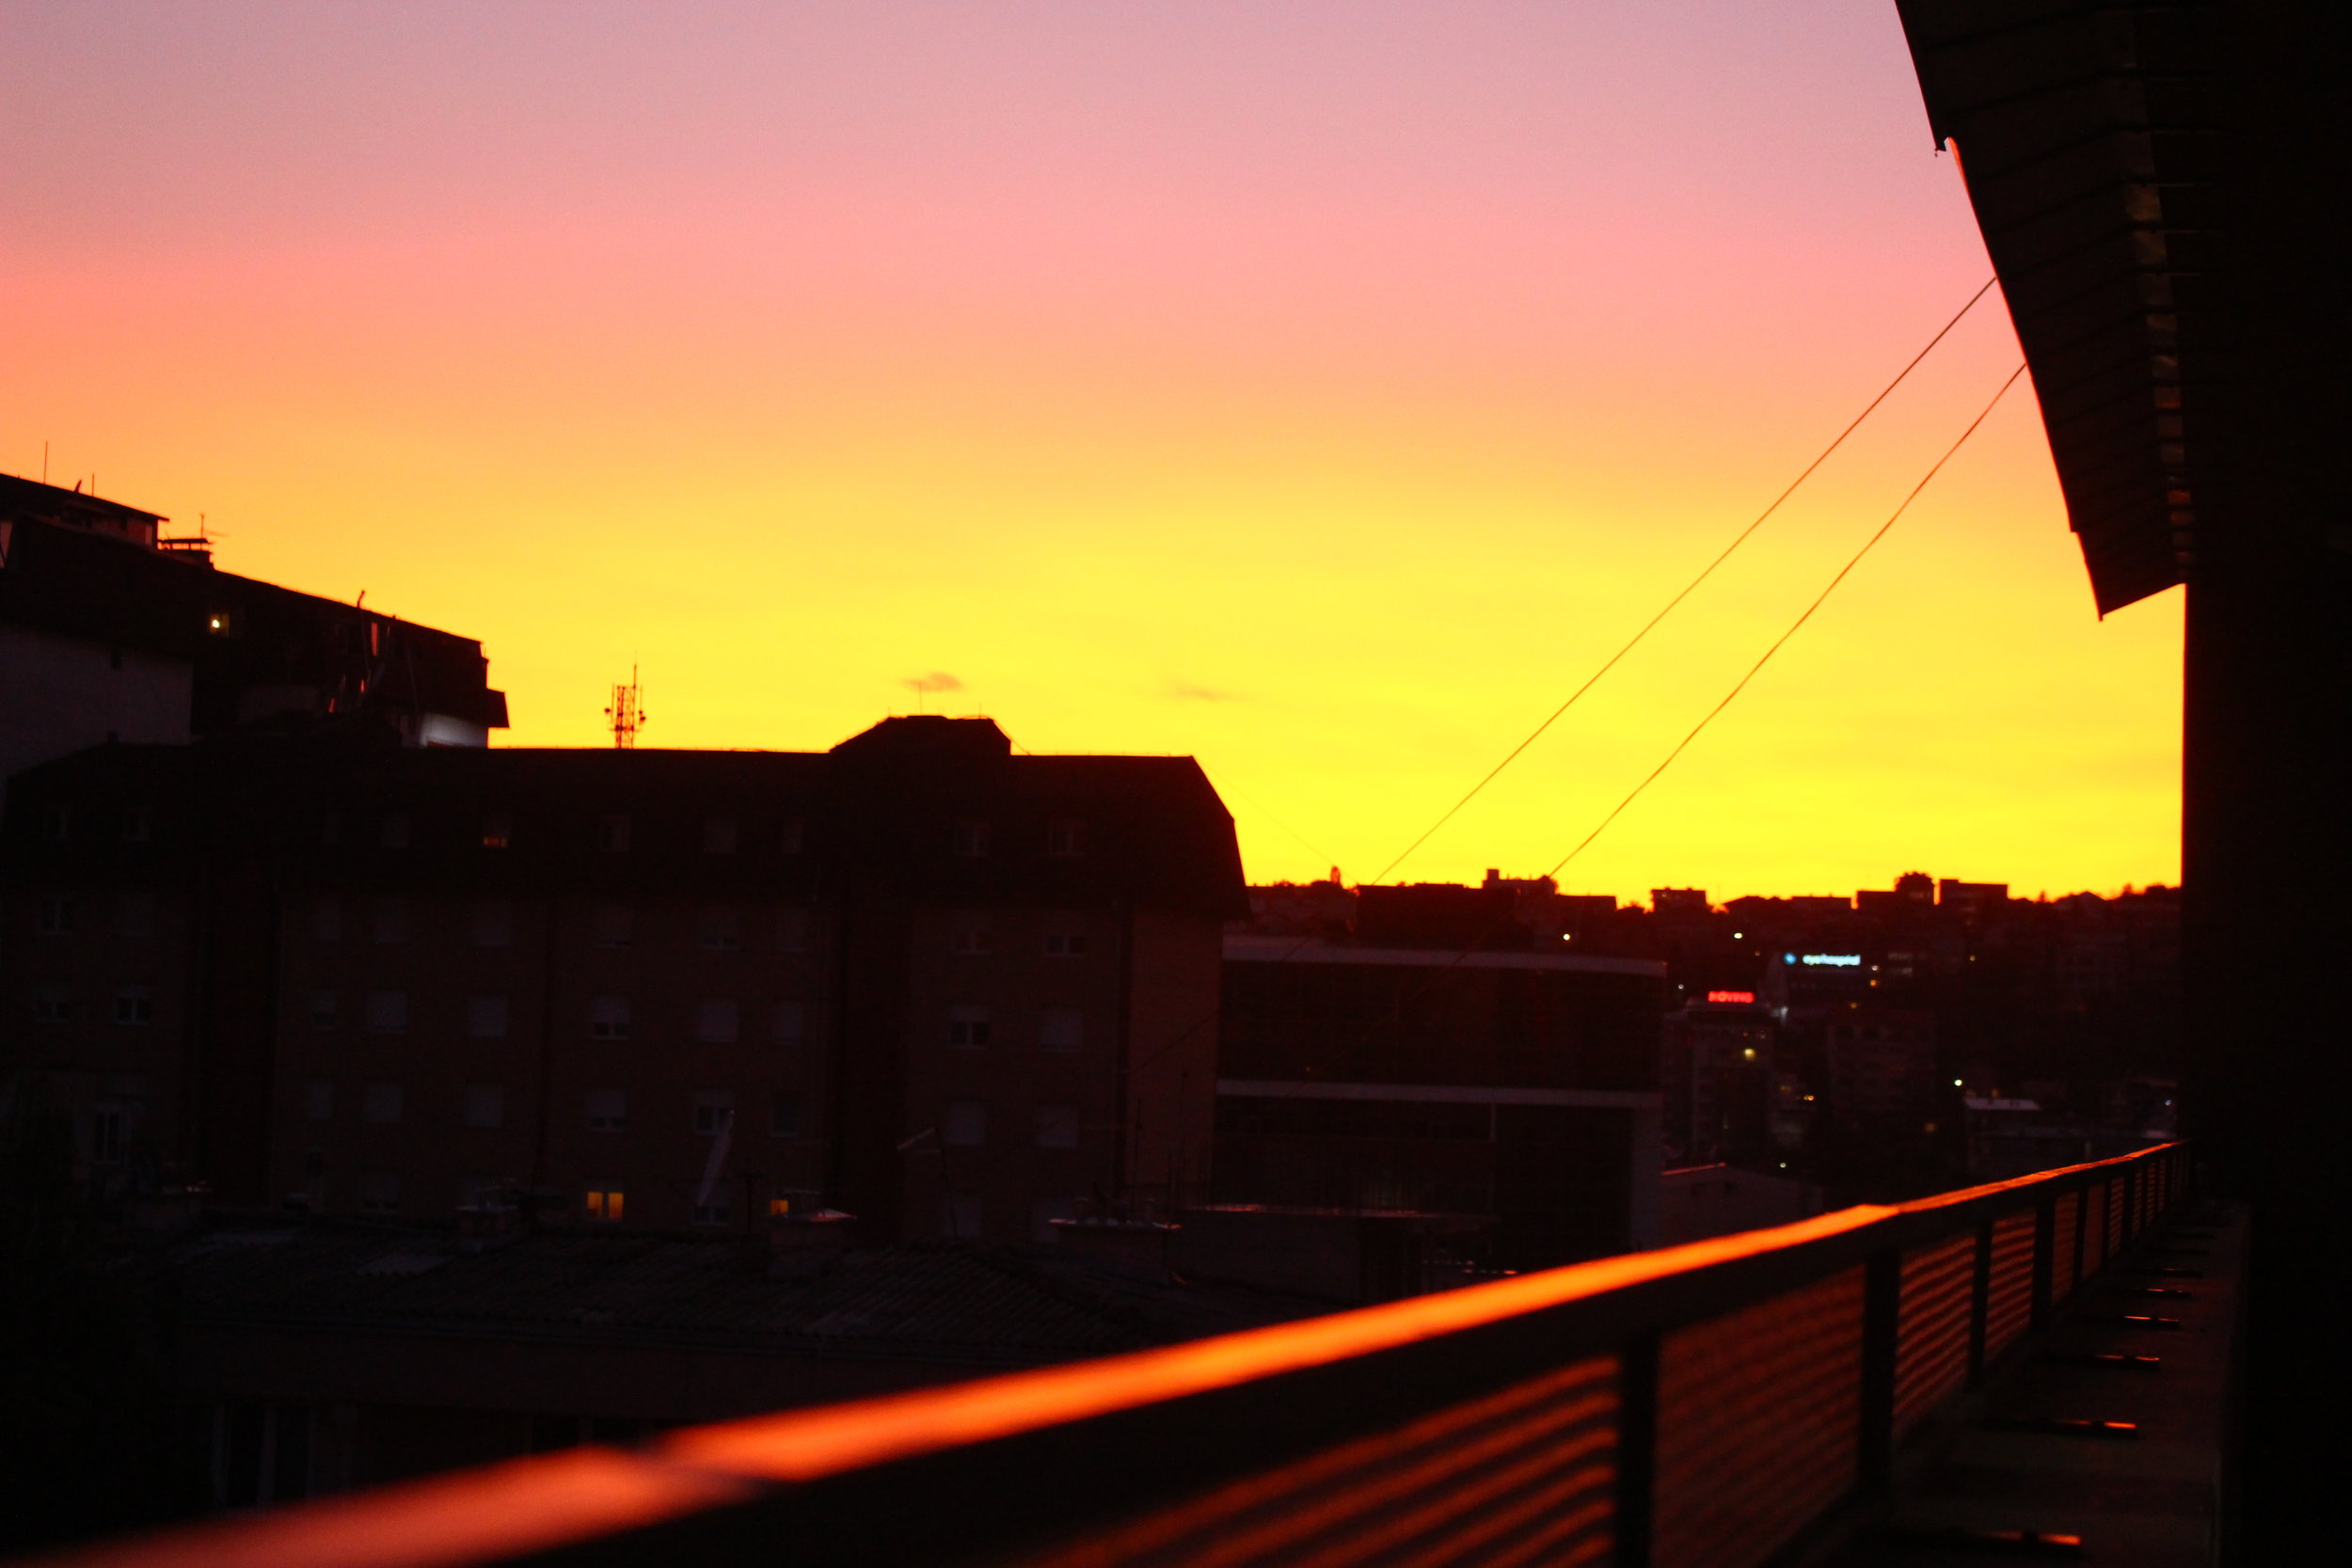 Sunset in Prishtina